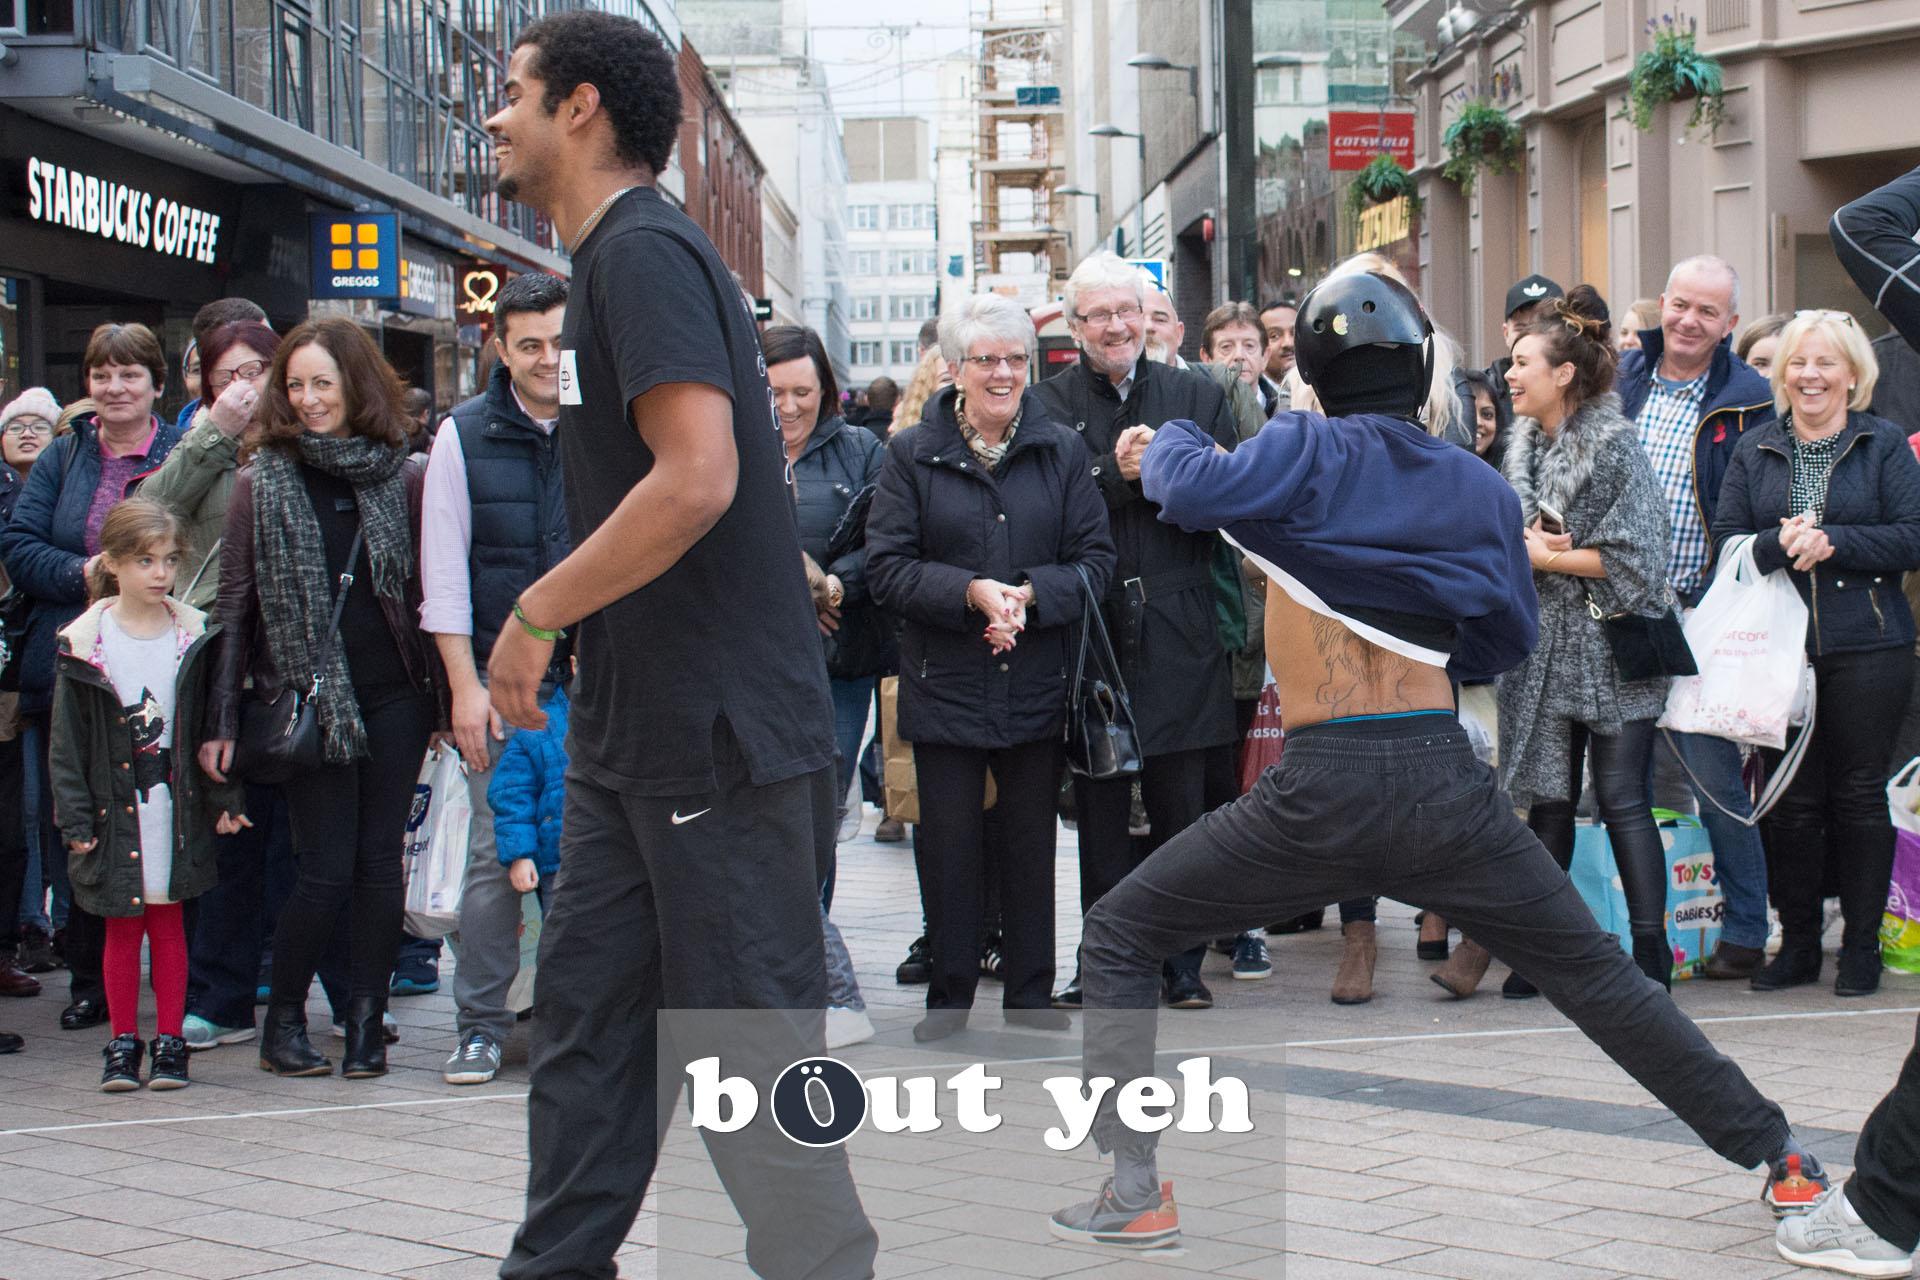 Street performers, Cornmarket, Belfast - photo 2757.